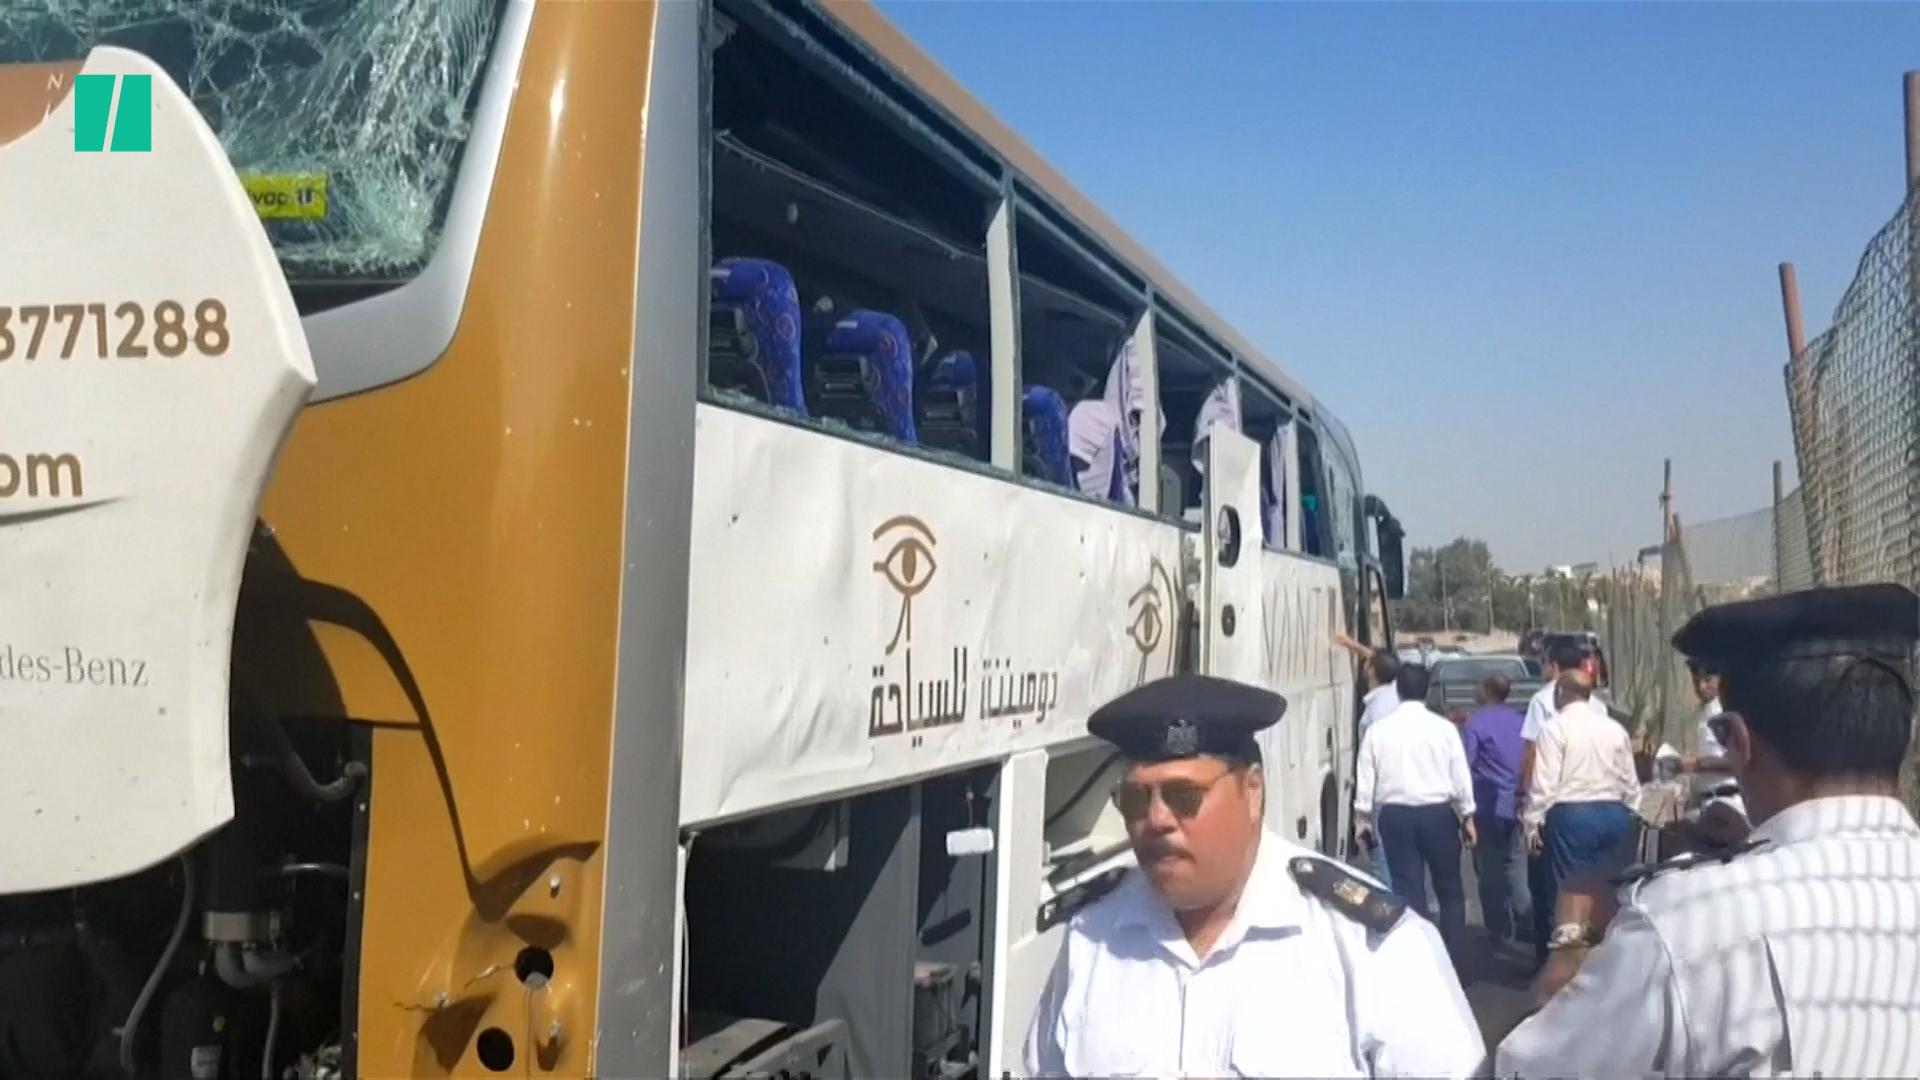 Bomb Blast Injures 17 Near Giza Pyramids In Egypt